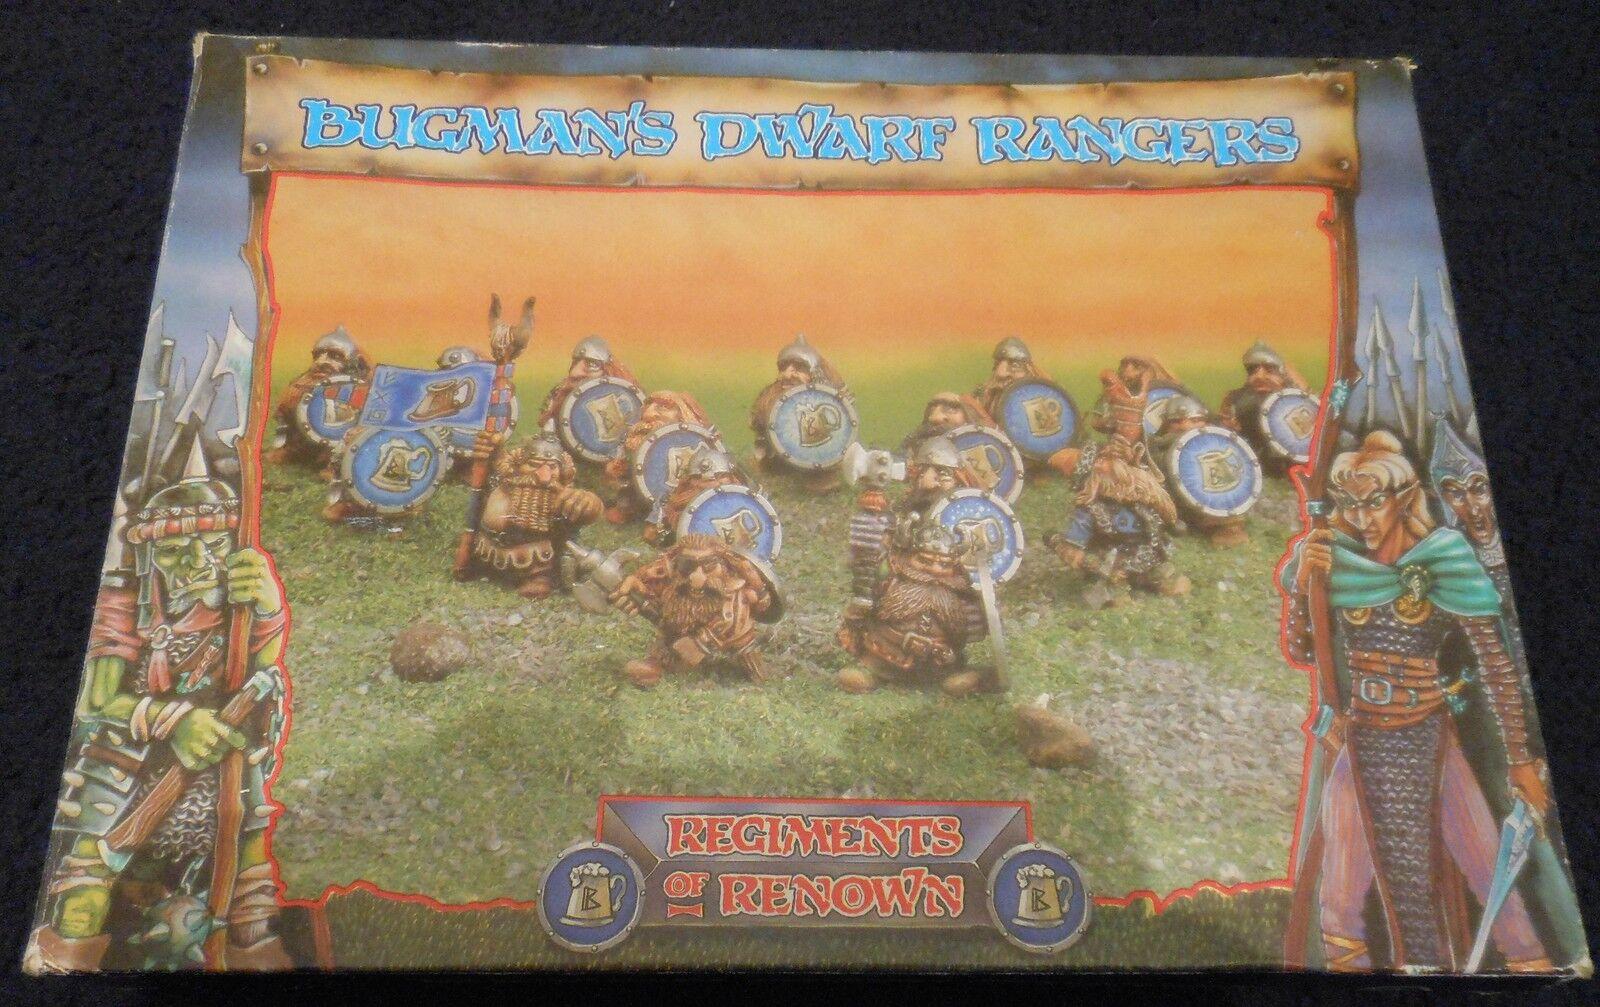 1986 bugmans Dwarf Rangers regimientos de renombre Bugman'S 81094 Brewer 0312 Ejército